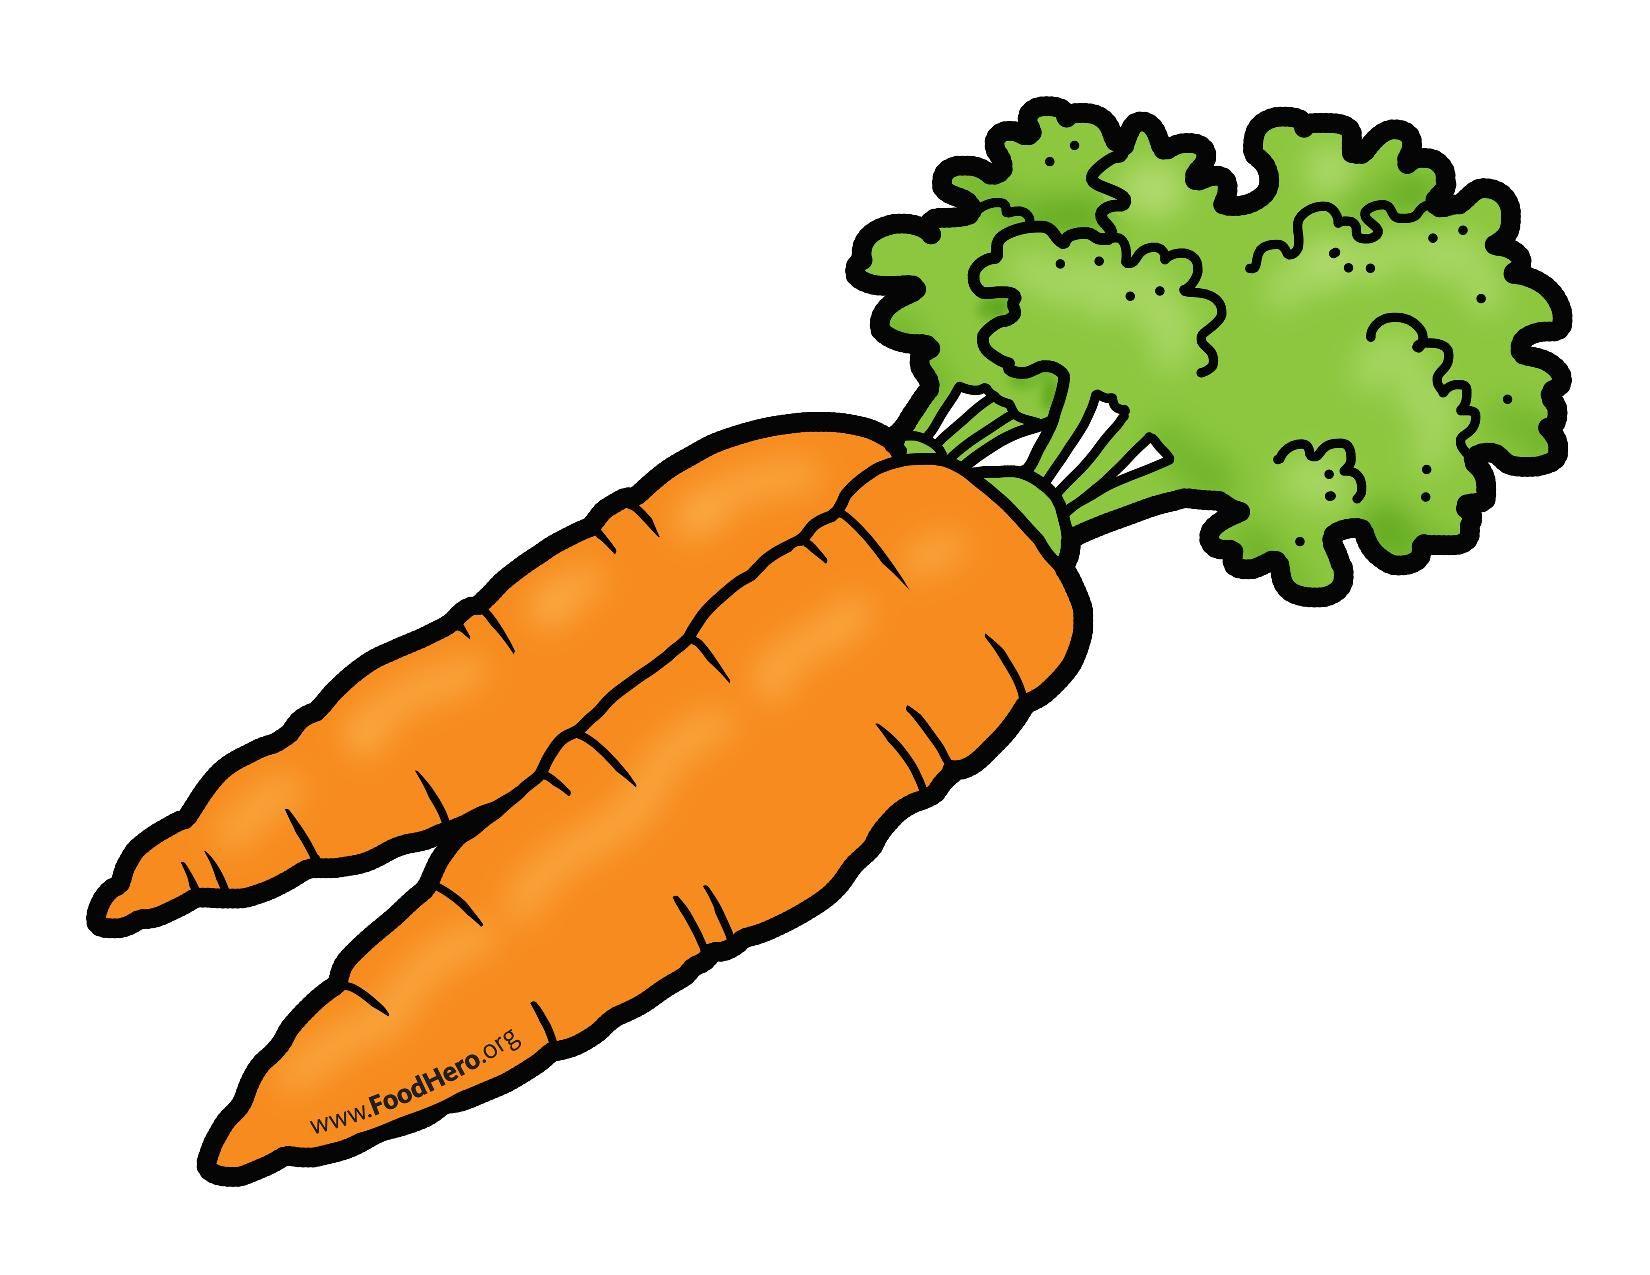 Carrot clipart vegetable. Illustration ingredients vegetables